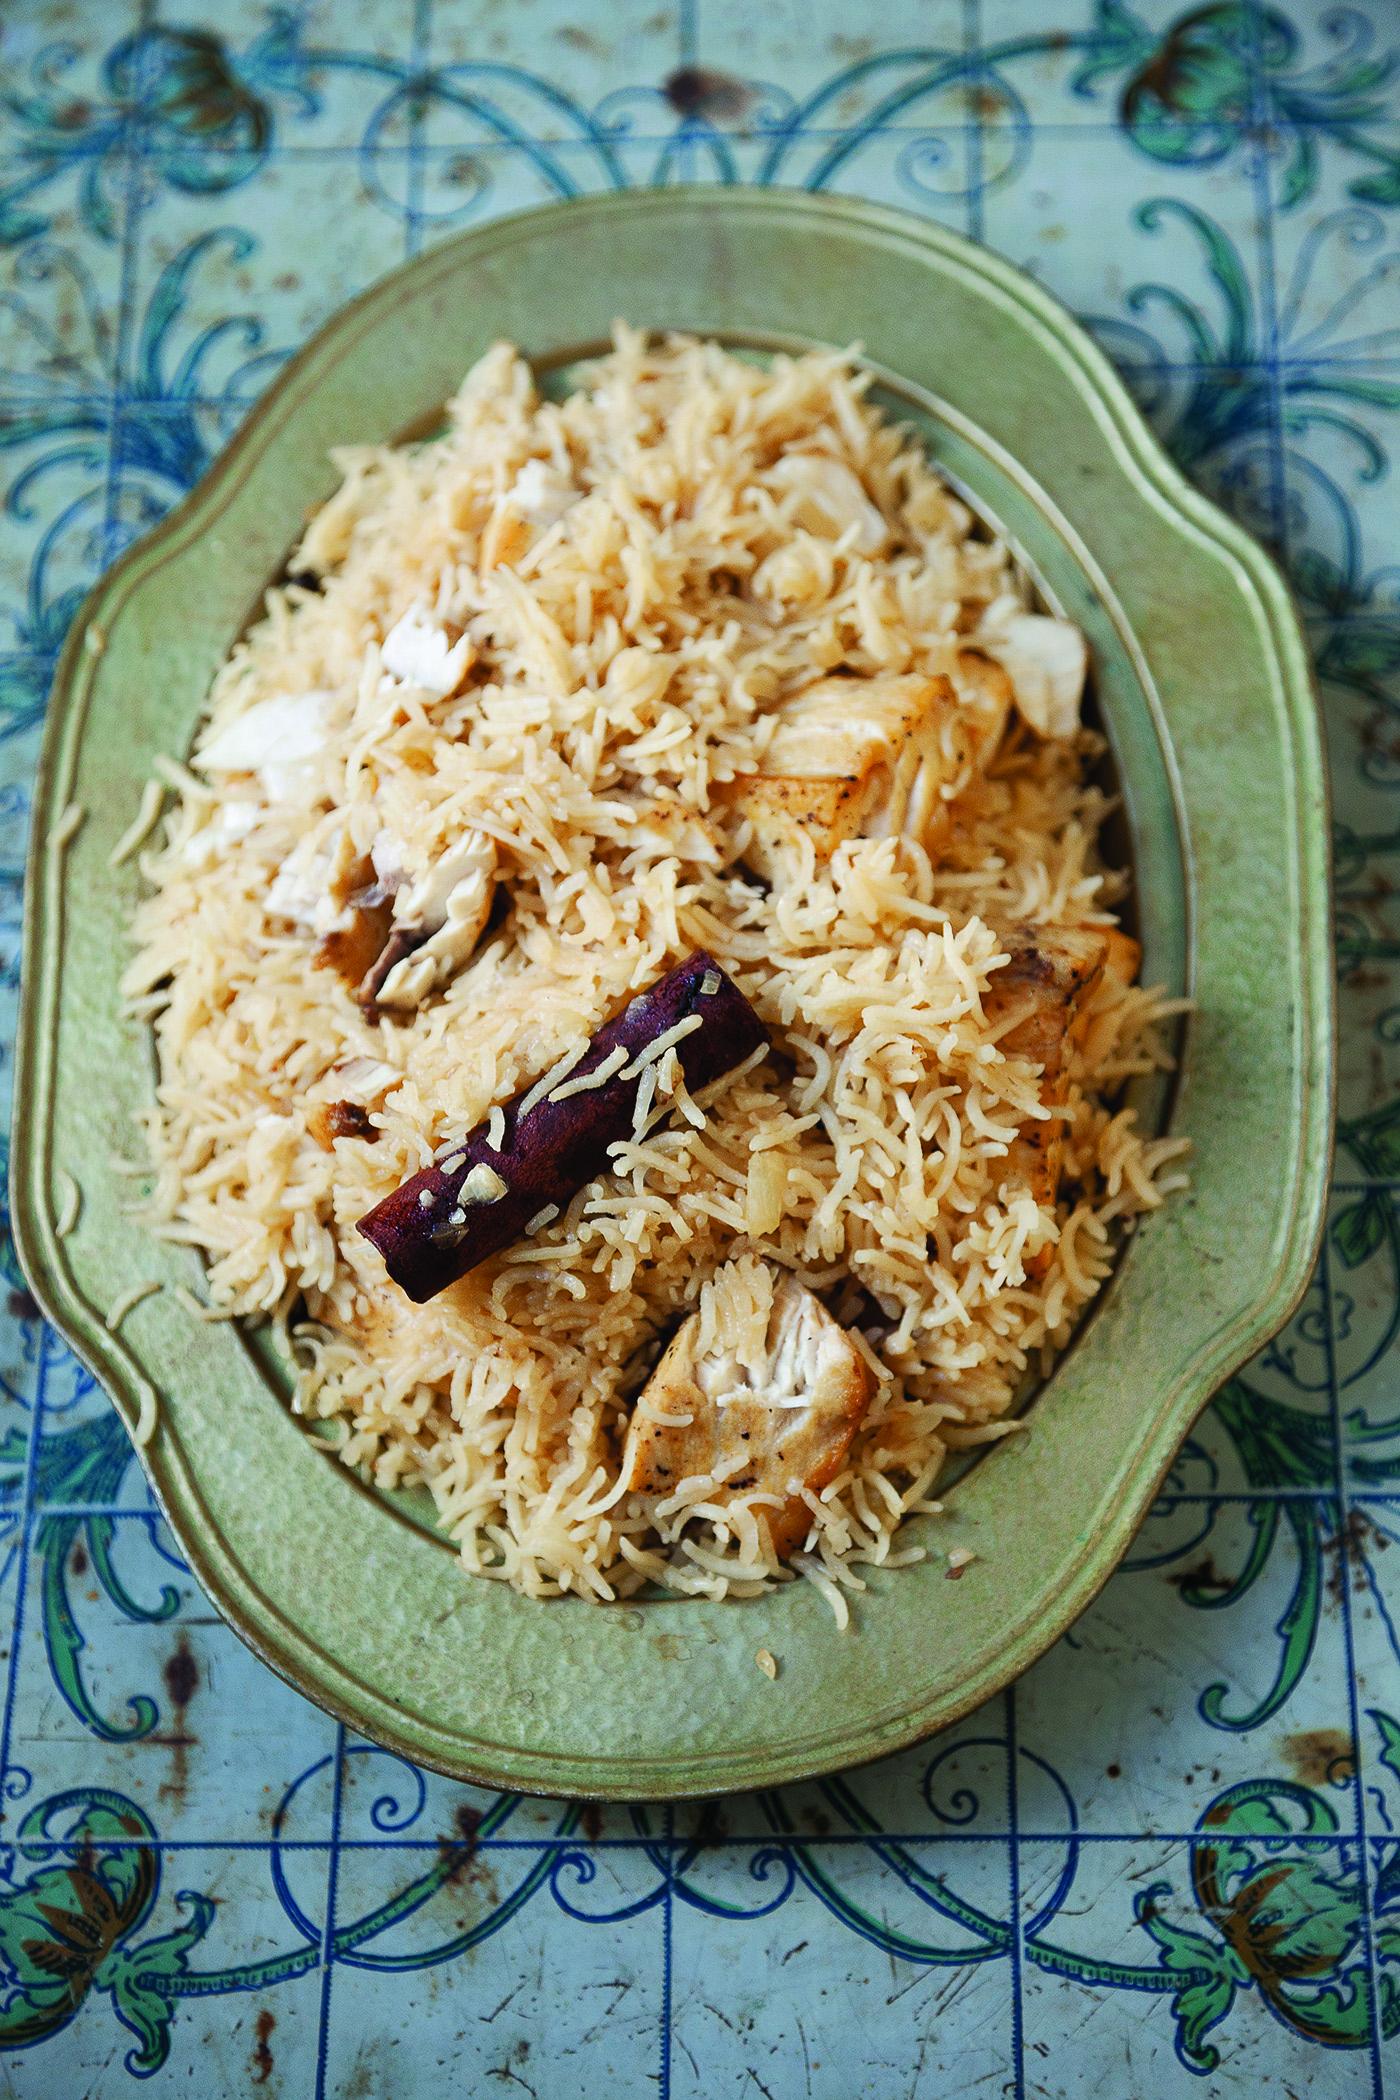 Sayadiya from Felicia Campbell's The Food of Oman   Photograph © Ariana Lindquist